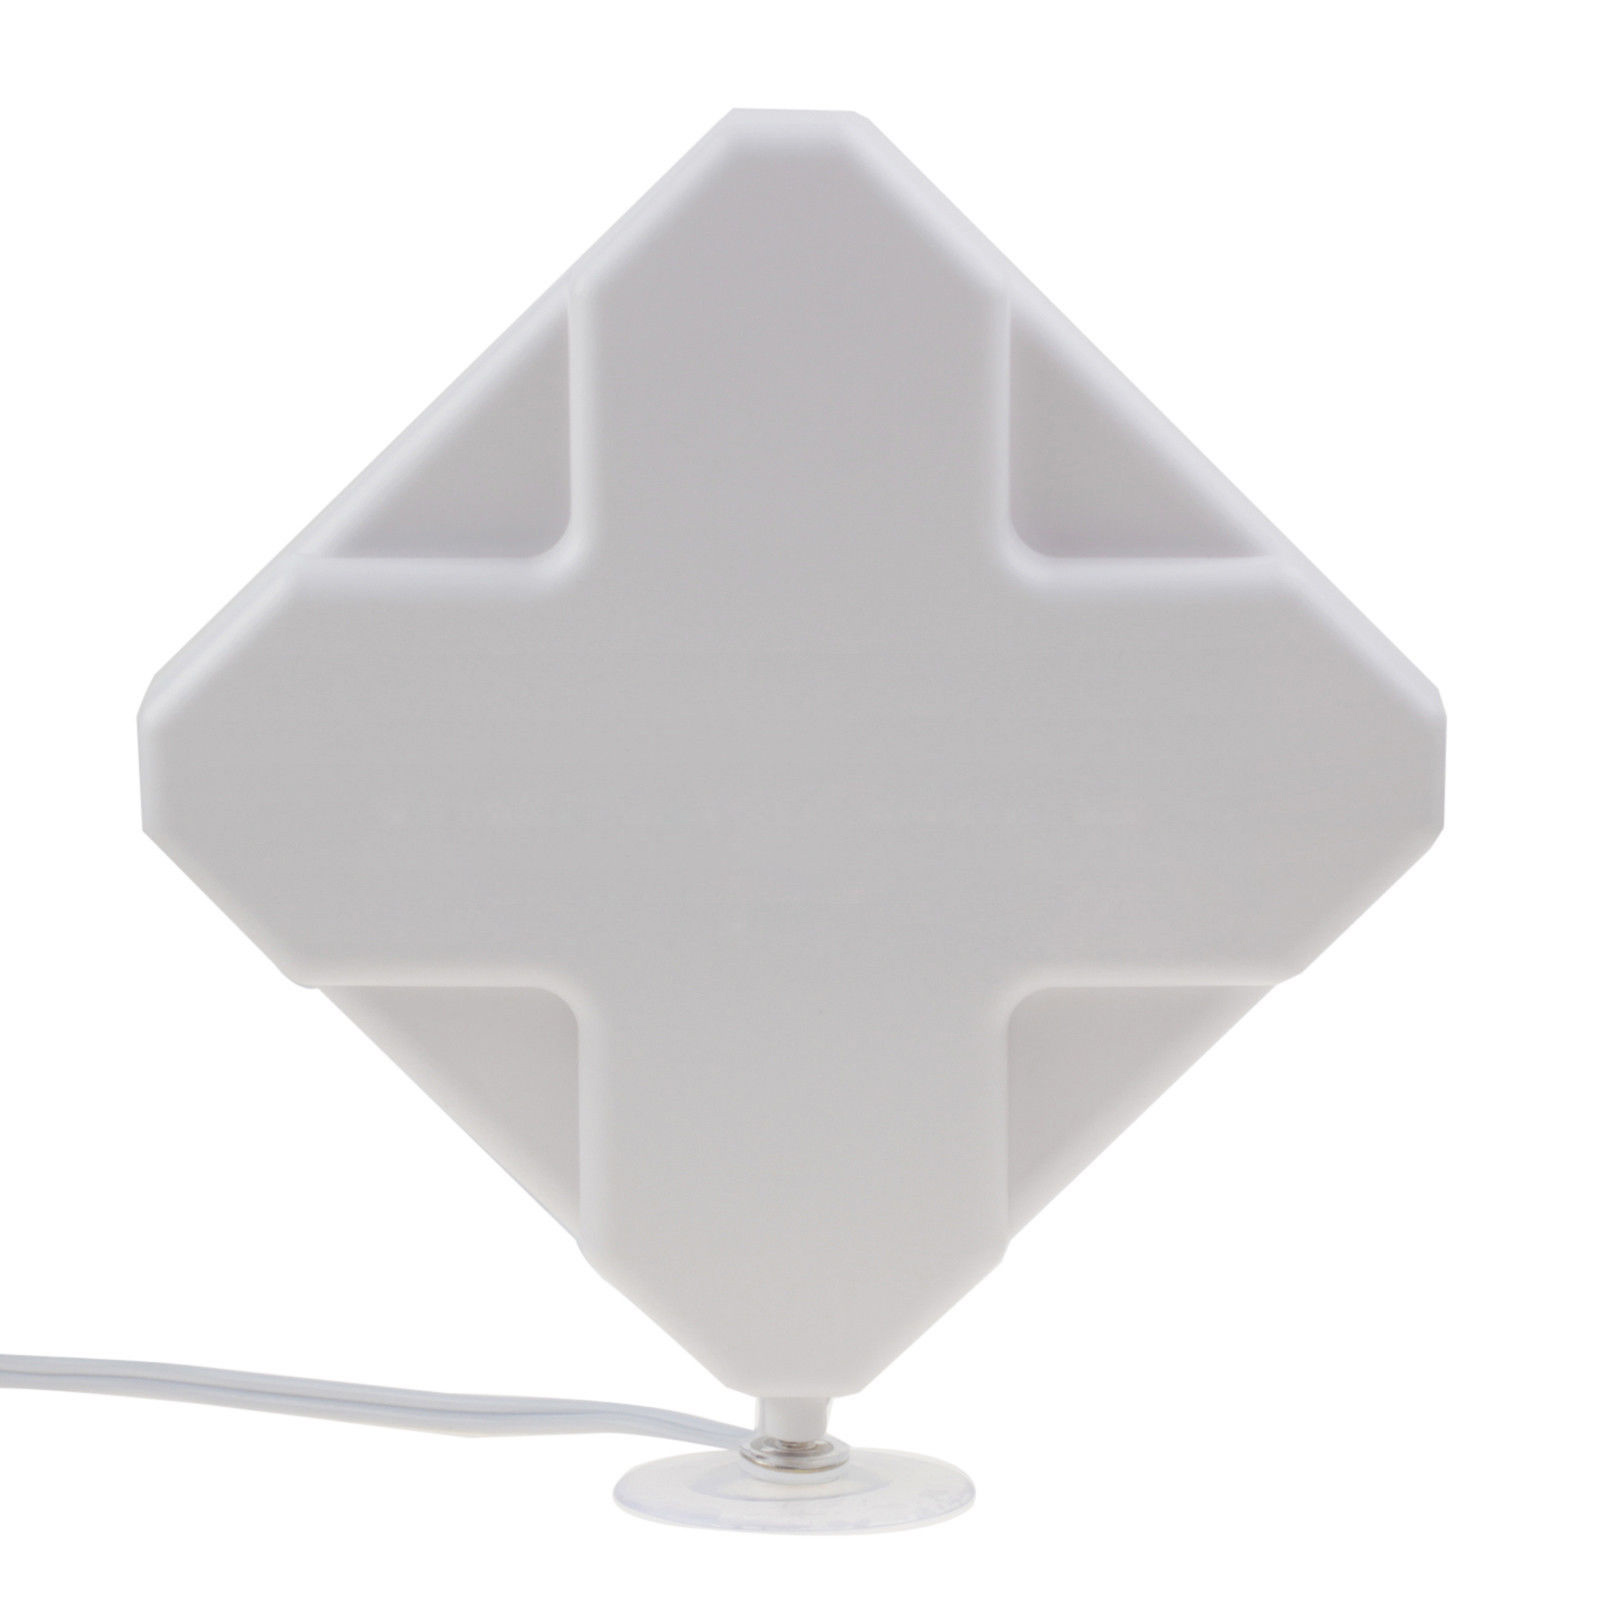 35dBi 3G 4G Antenna LTE TS9 Broadband Signal Amplifier HUAWEI E392/E397/E398